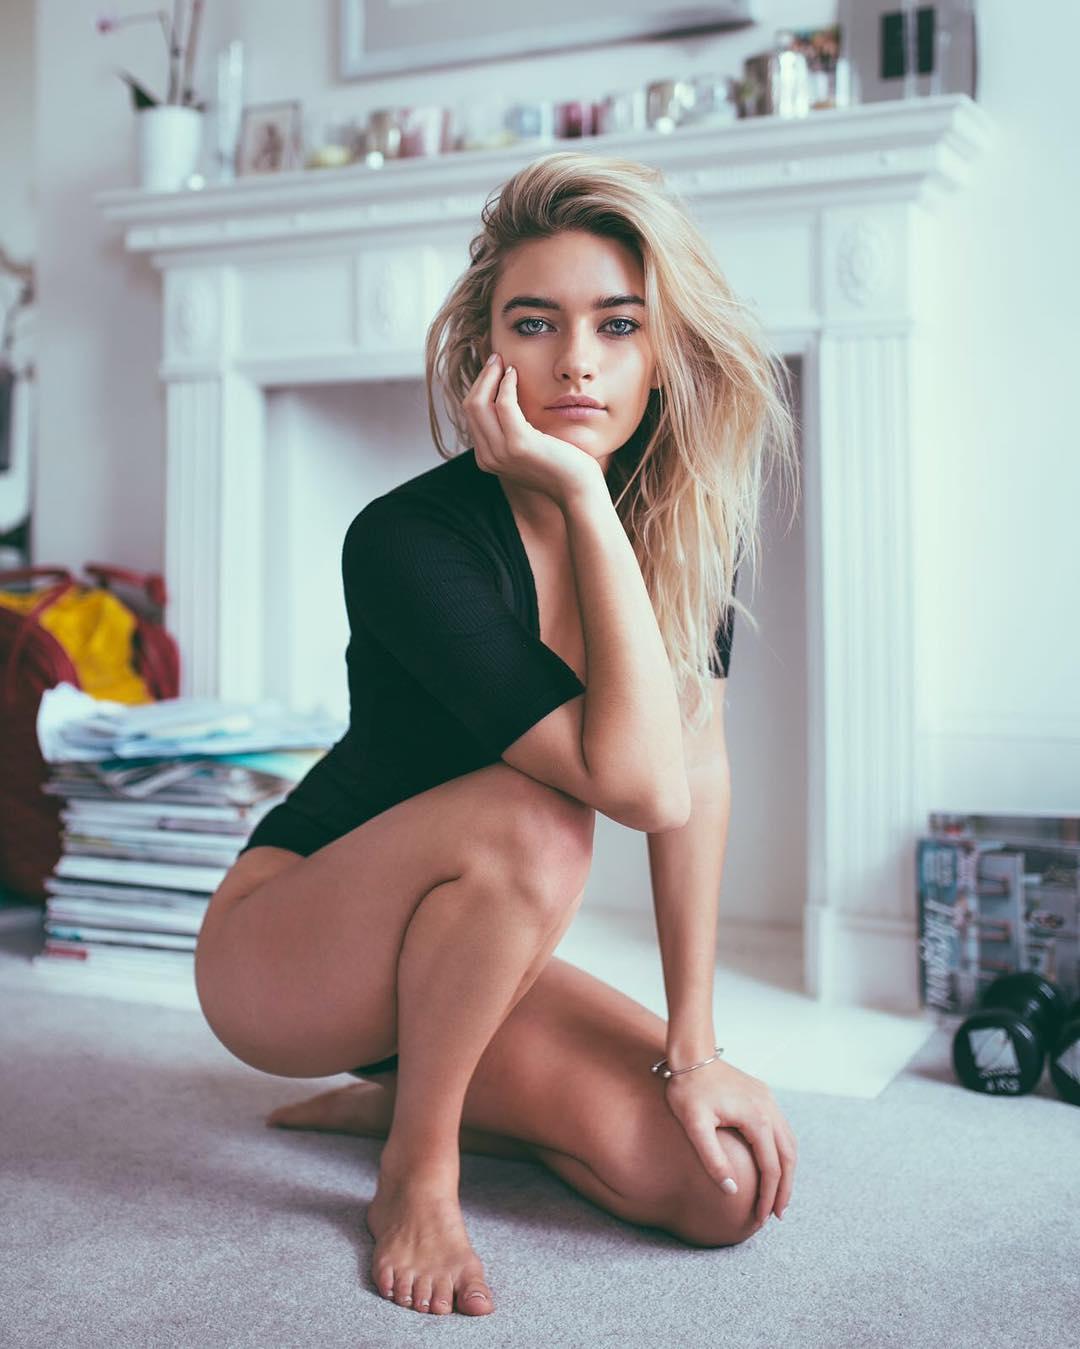 Selfie Tess Jantschek naked (56 photos), Tits, Paparazzi, Twitter, panties 2018